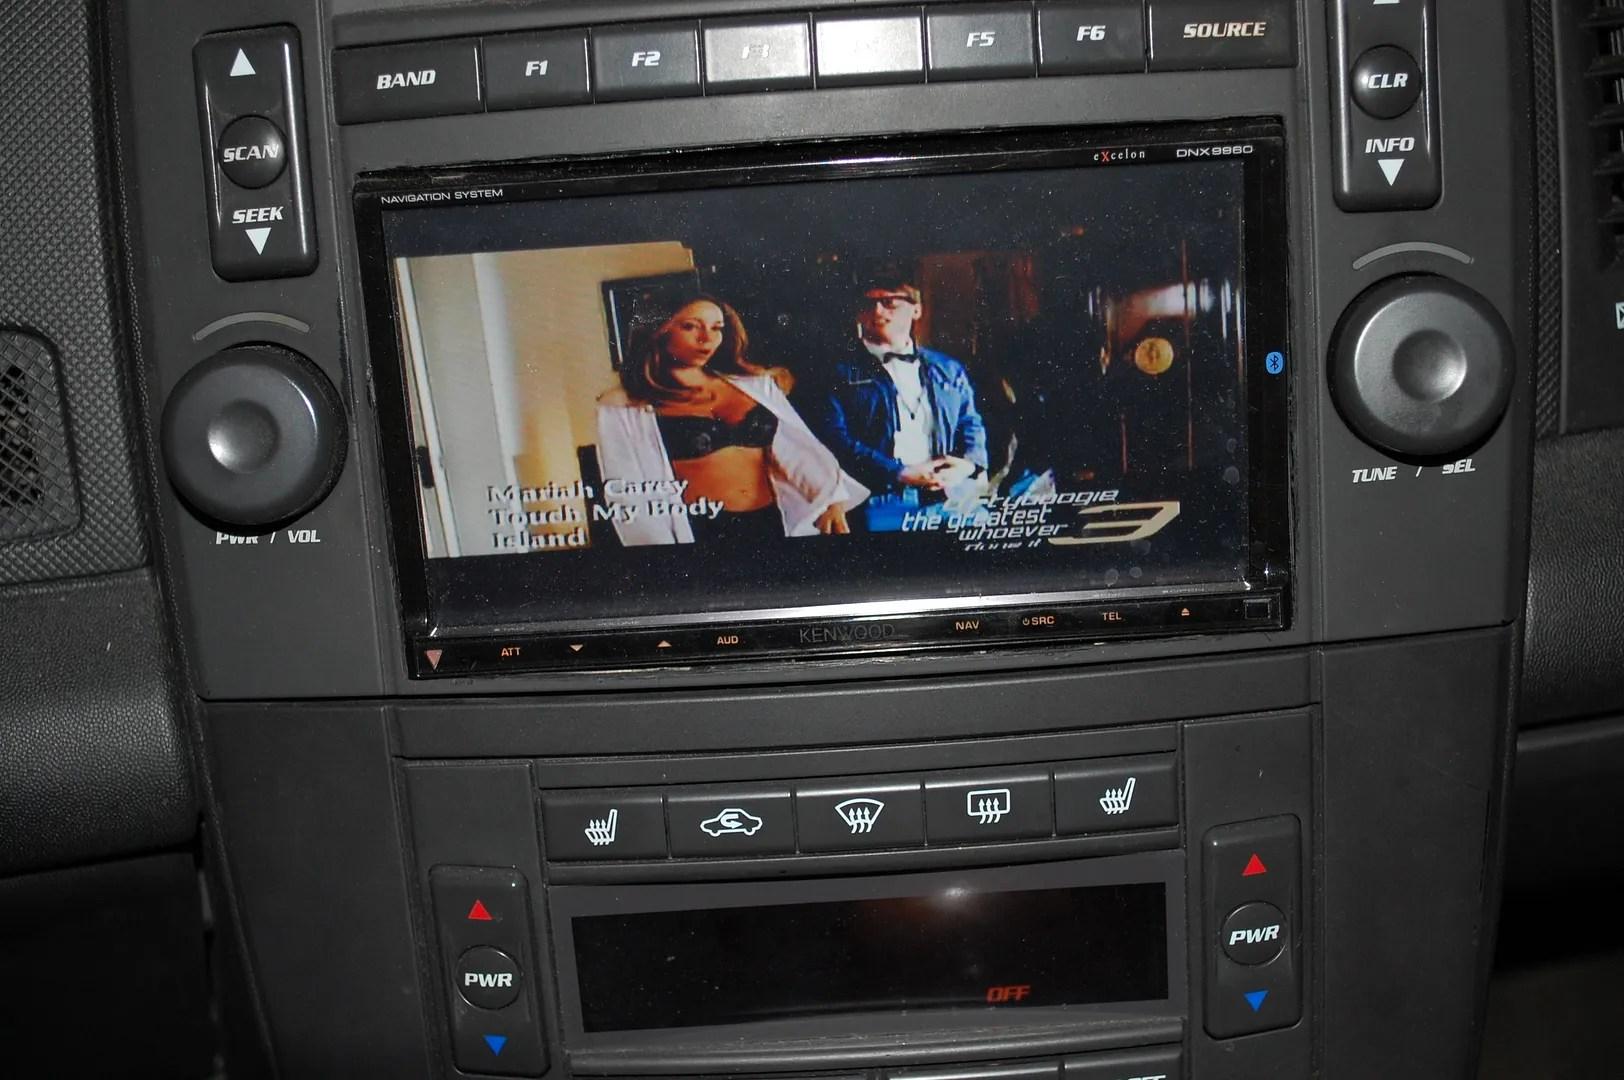 2007 Cadillac Cts Aftermarket Radio - wiring diagrams image free